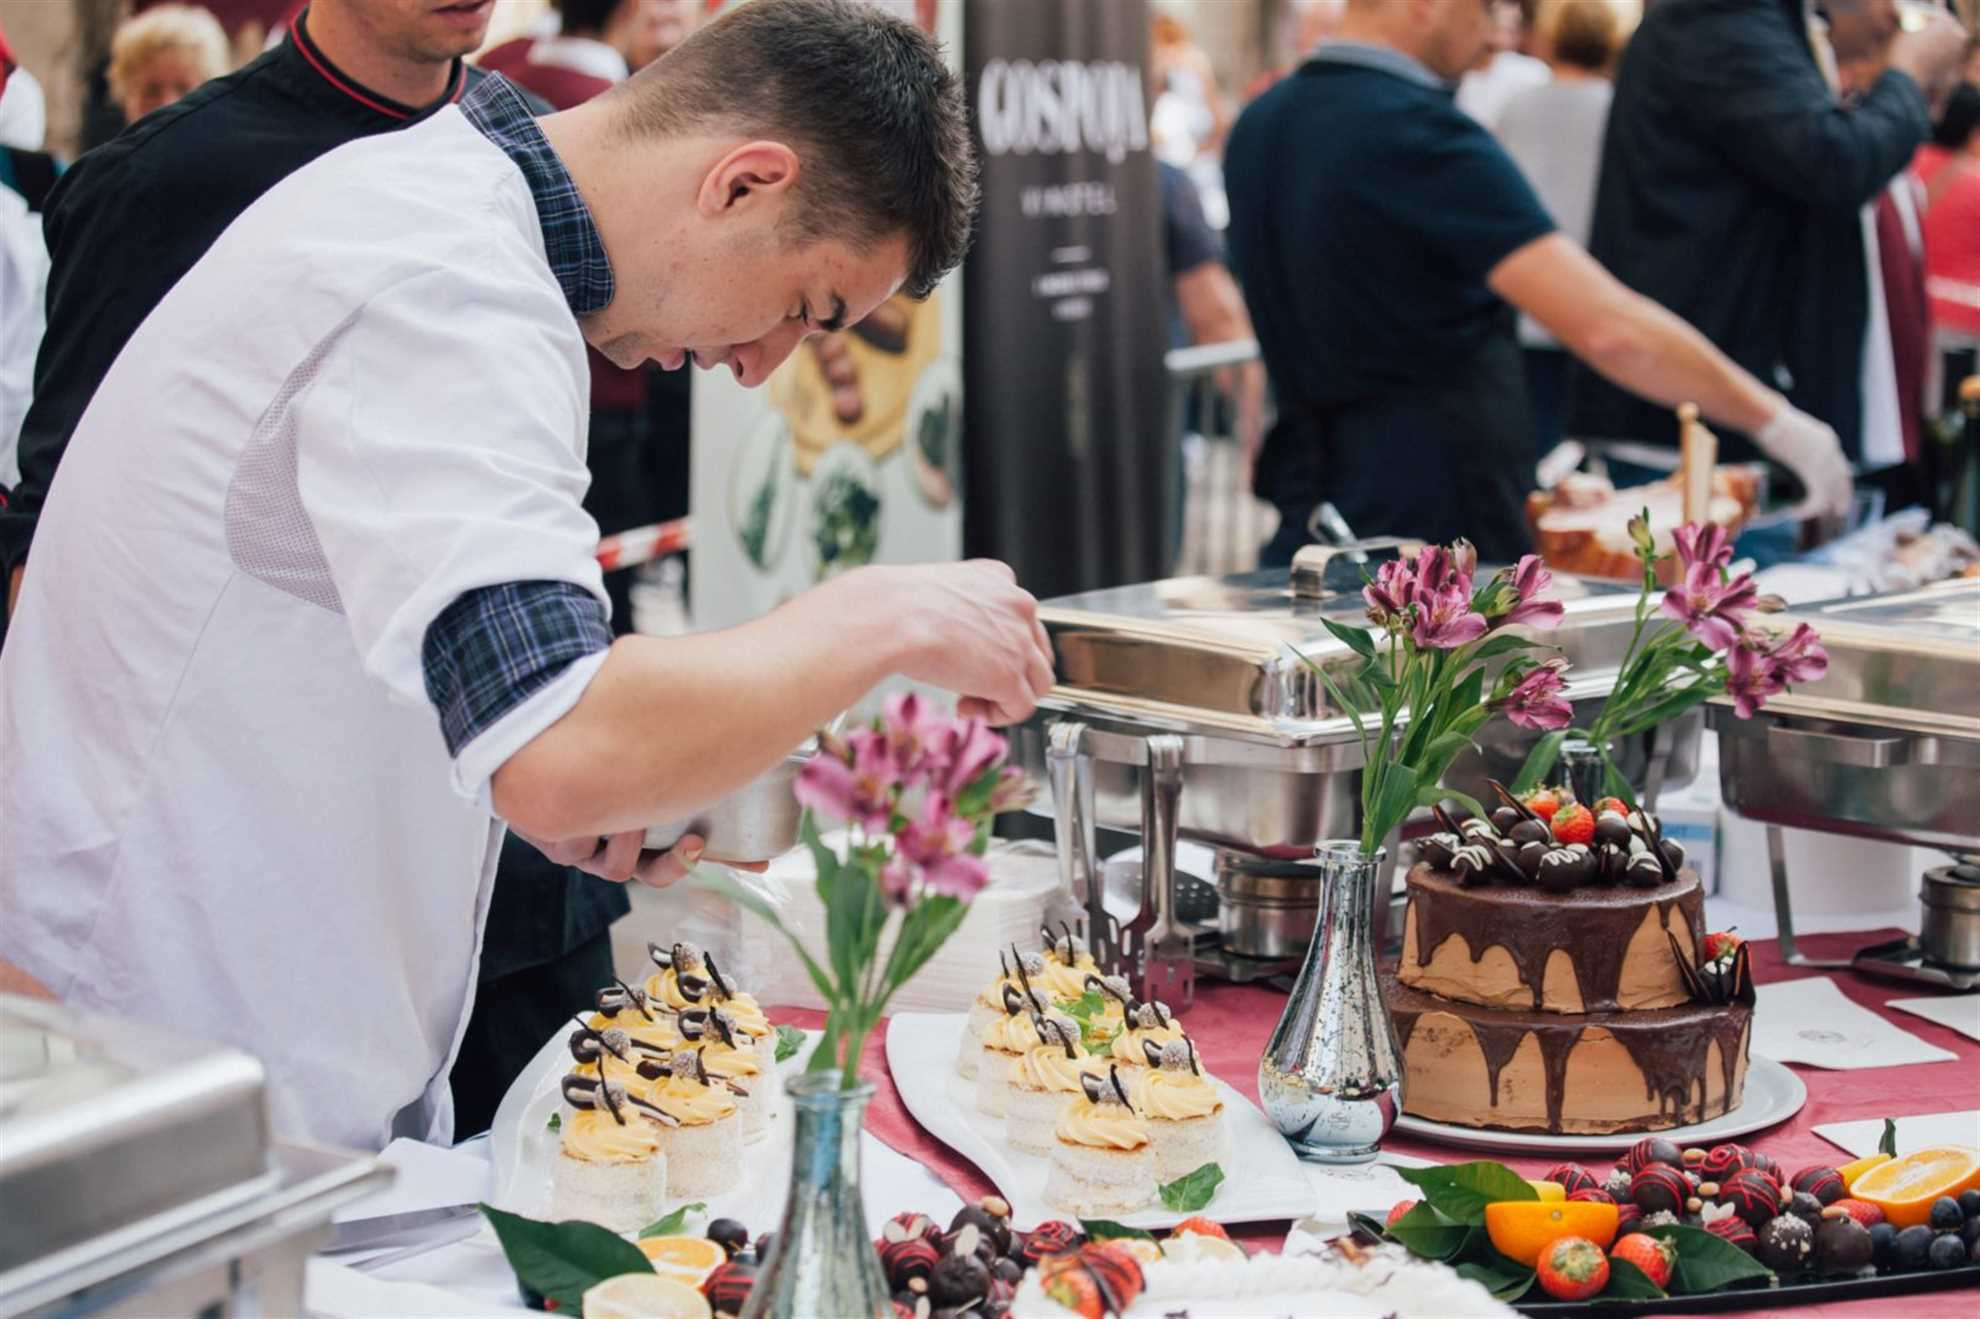 Good Food Festival in Dubrovnik 2017